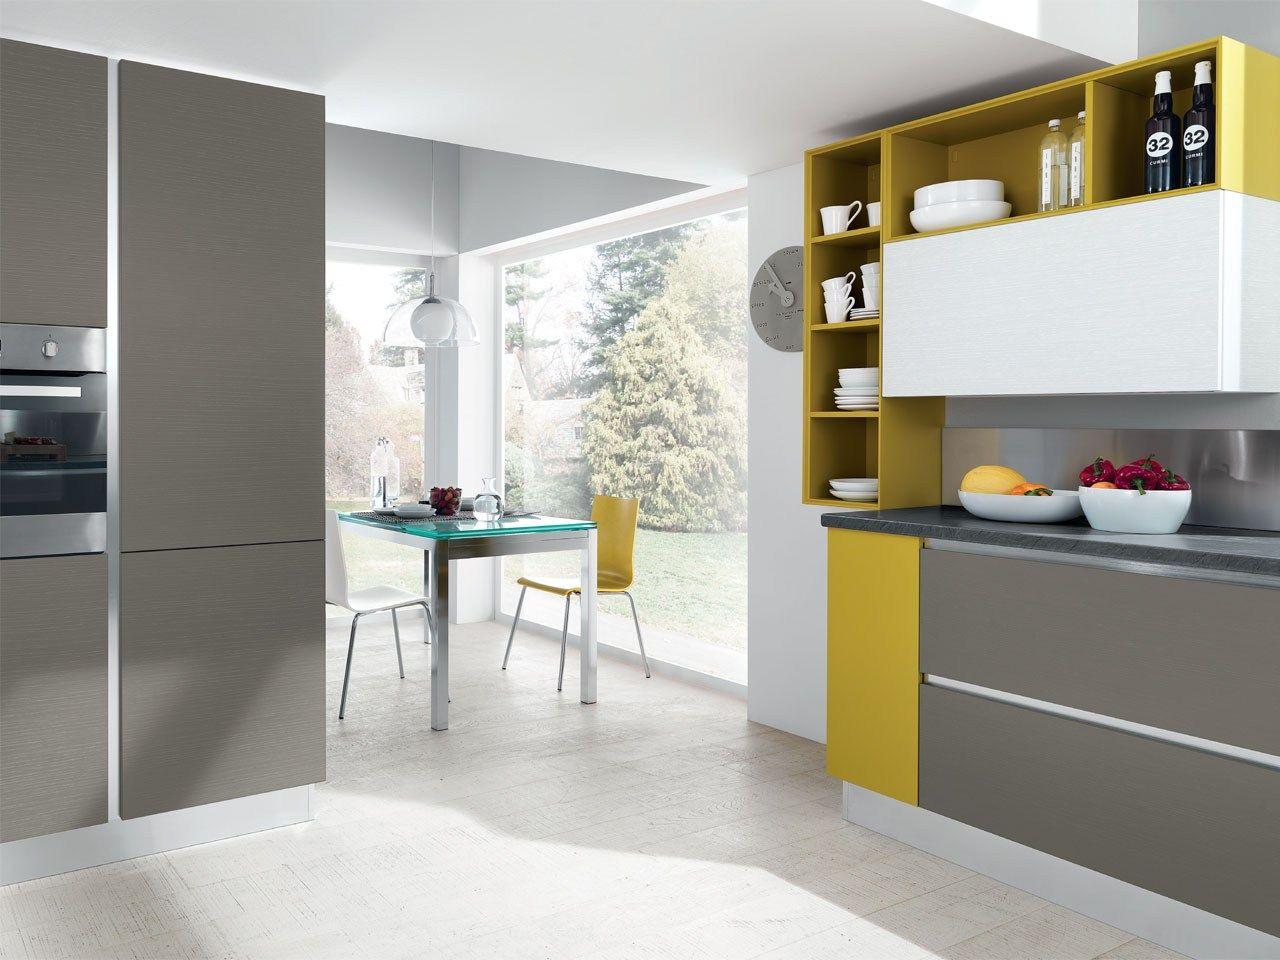 Cucina componibile in legno senza maniglie collezione - Cucina senza maniglie ...